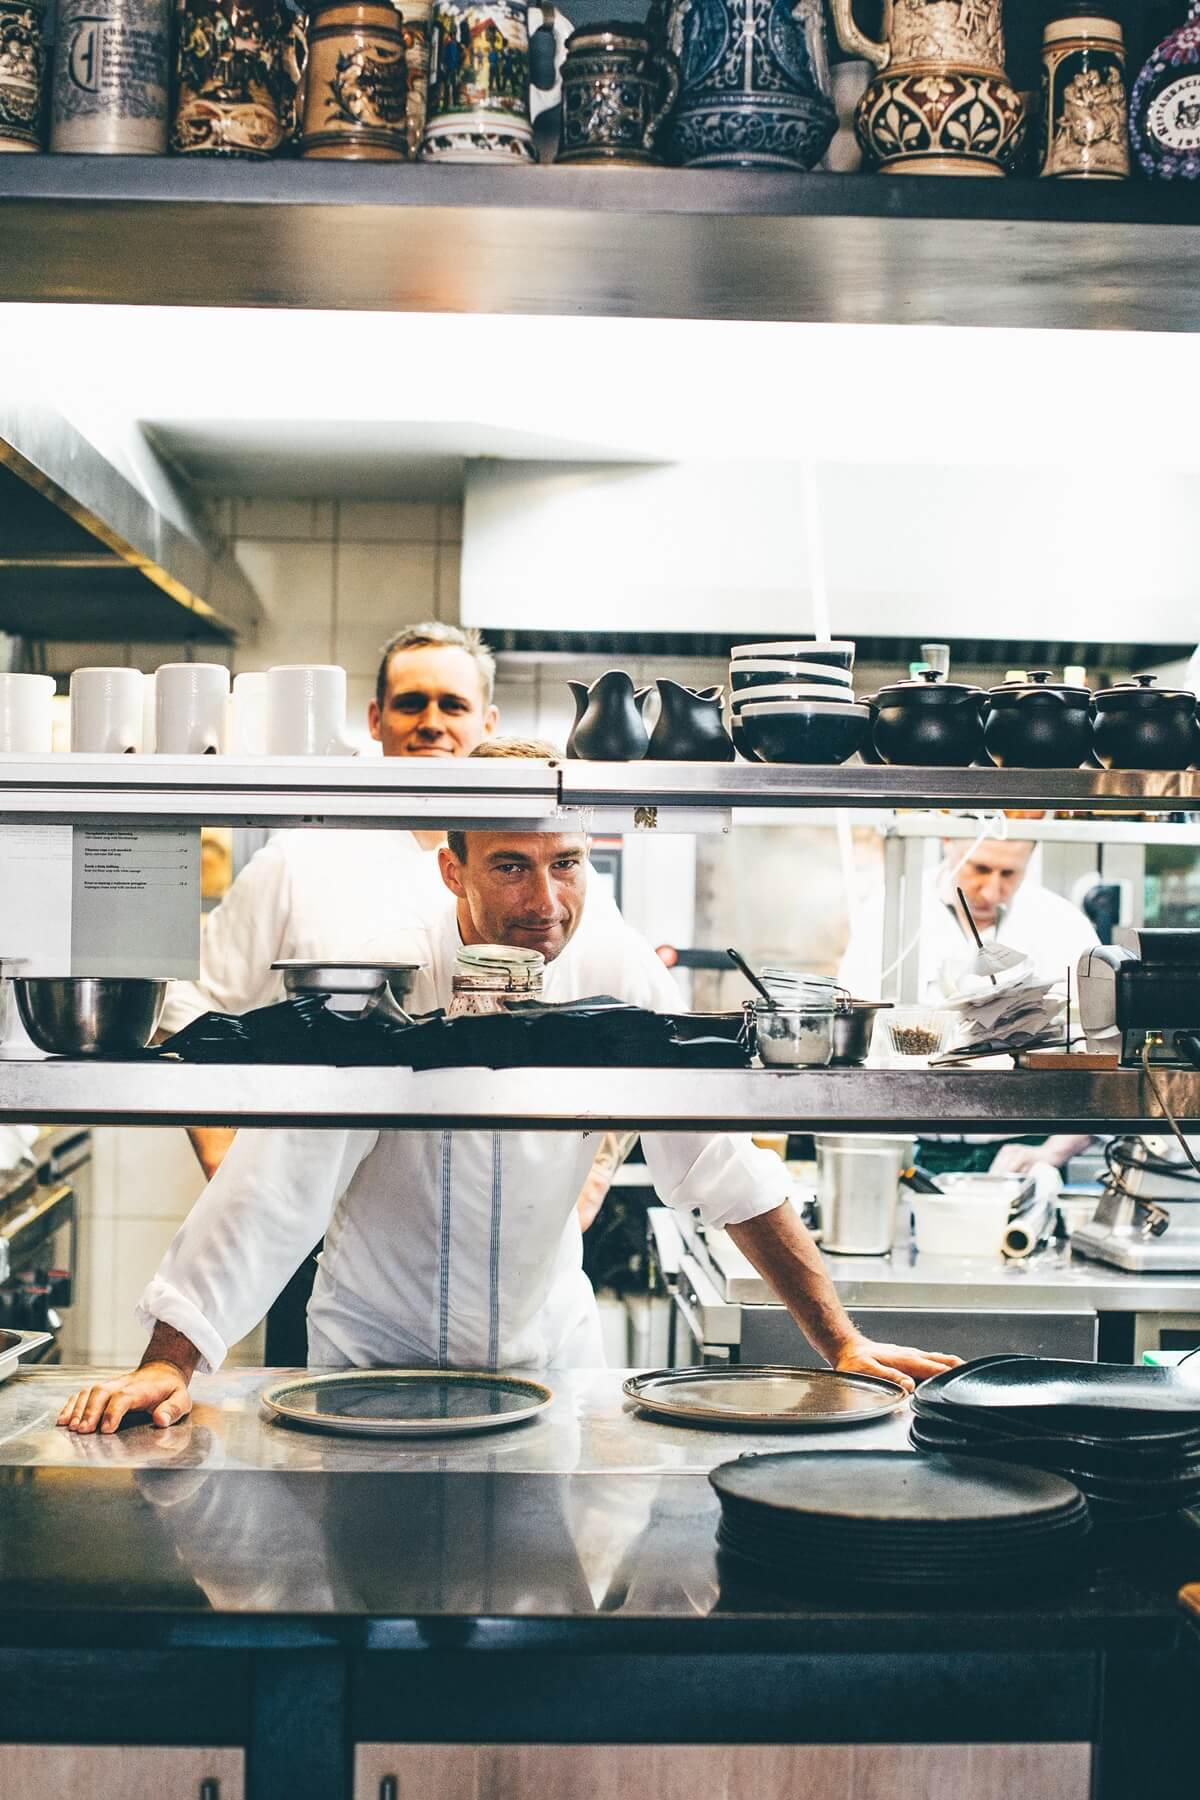 Kubicki 1 1 - A must see on the map of Gdańsk: Kubicki restaurant